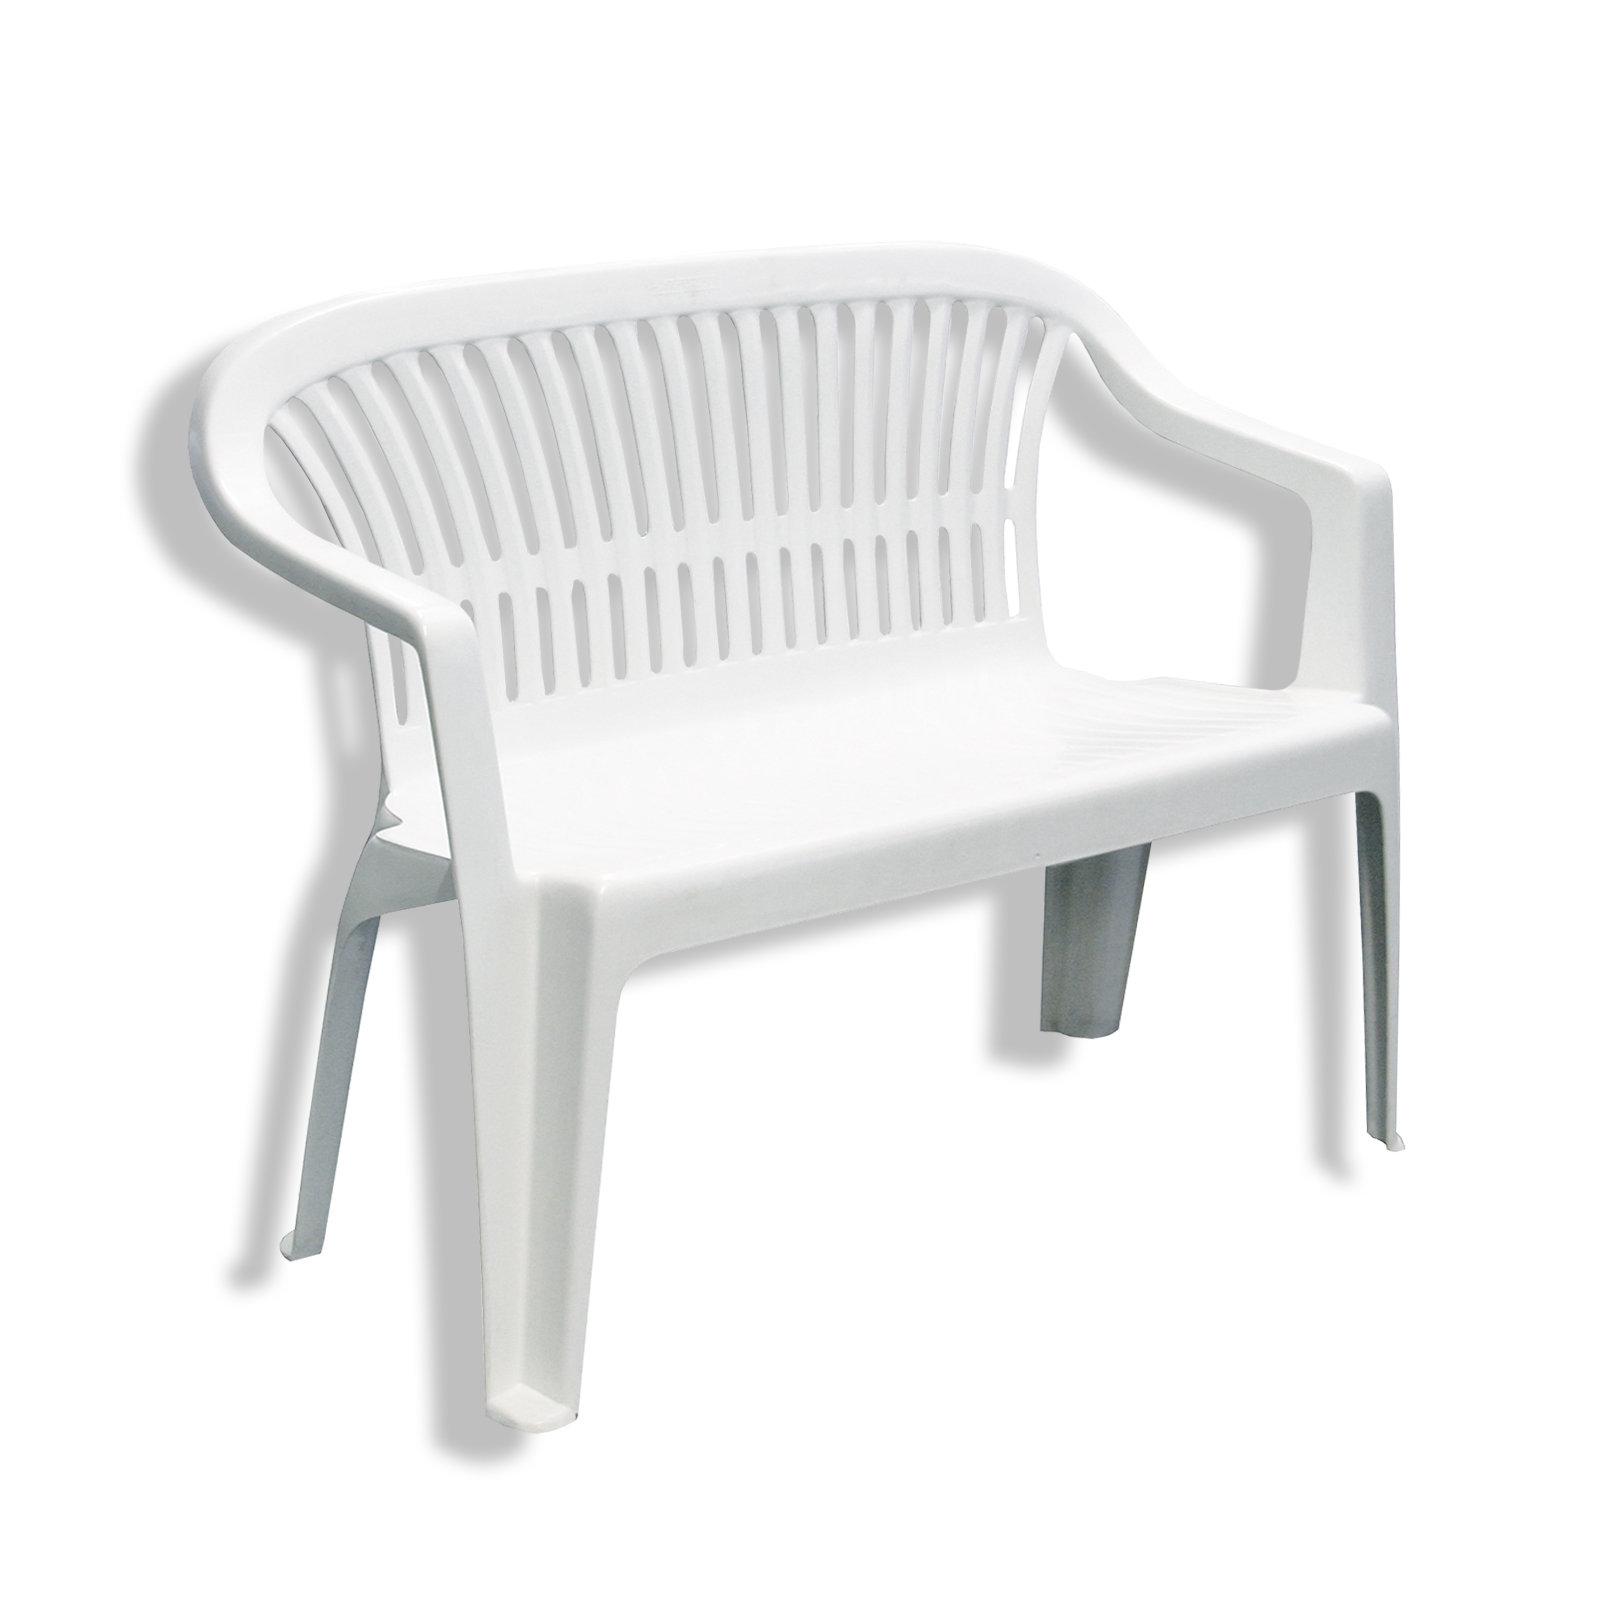 Gartenbank Kunststoff Weiß